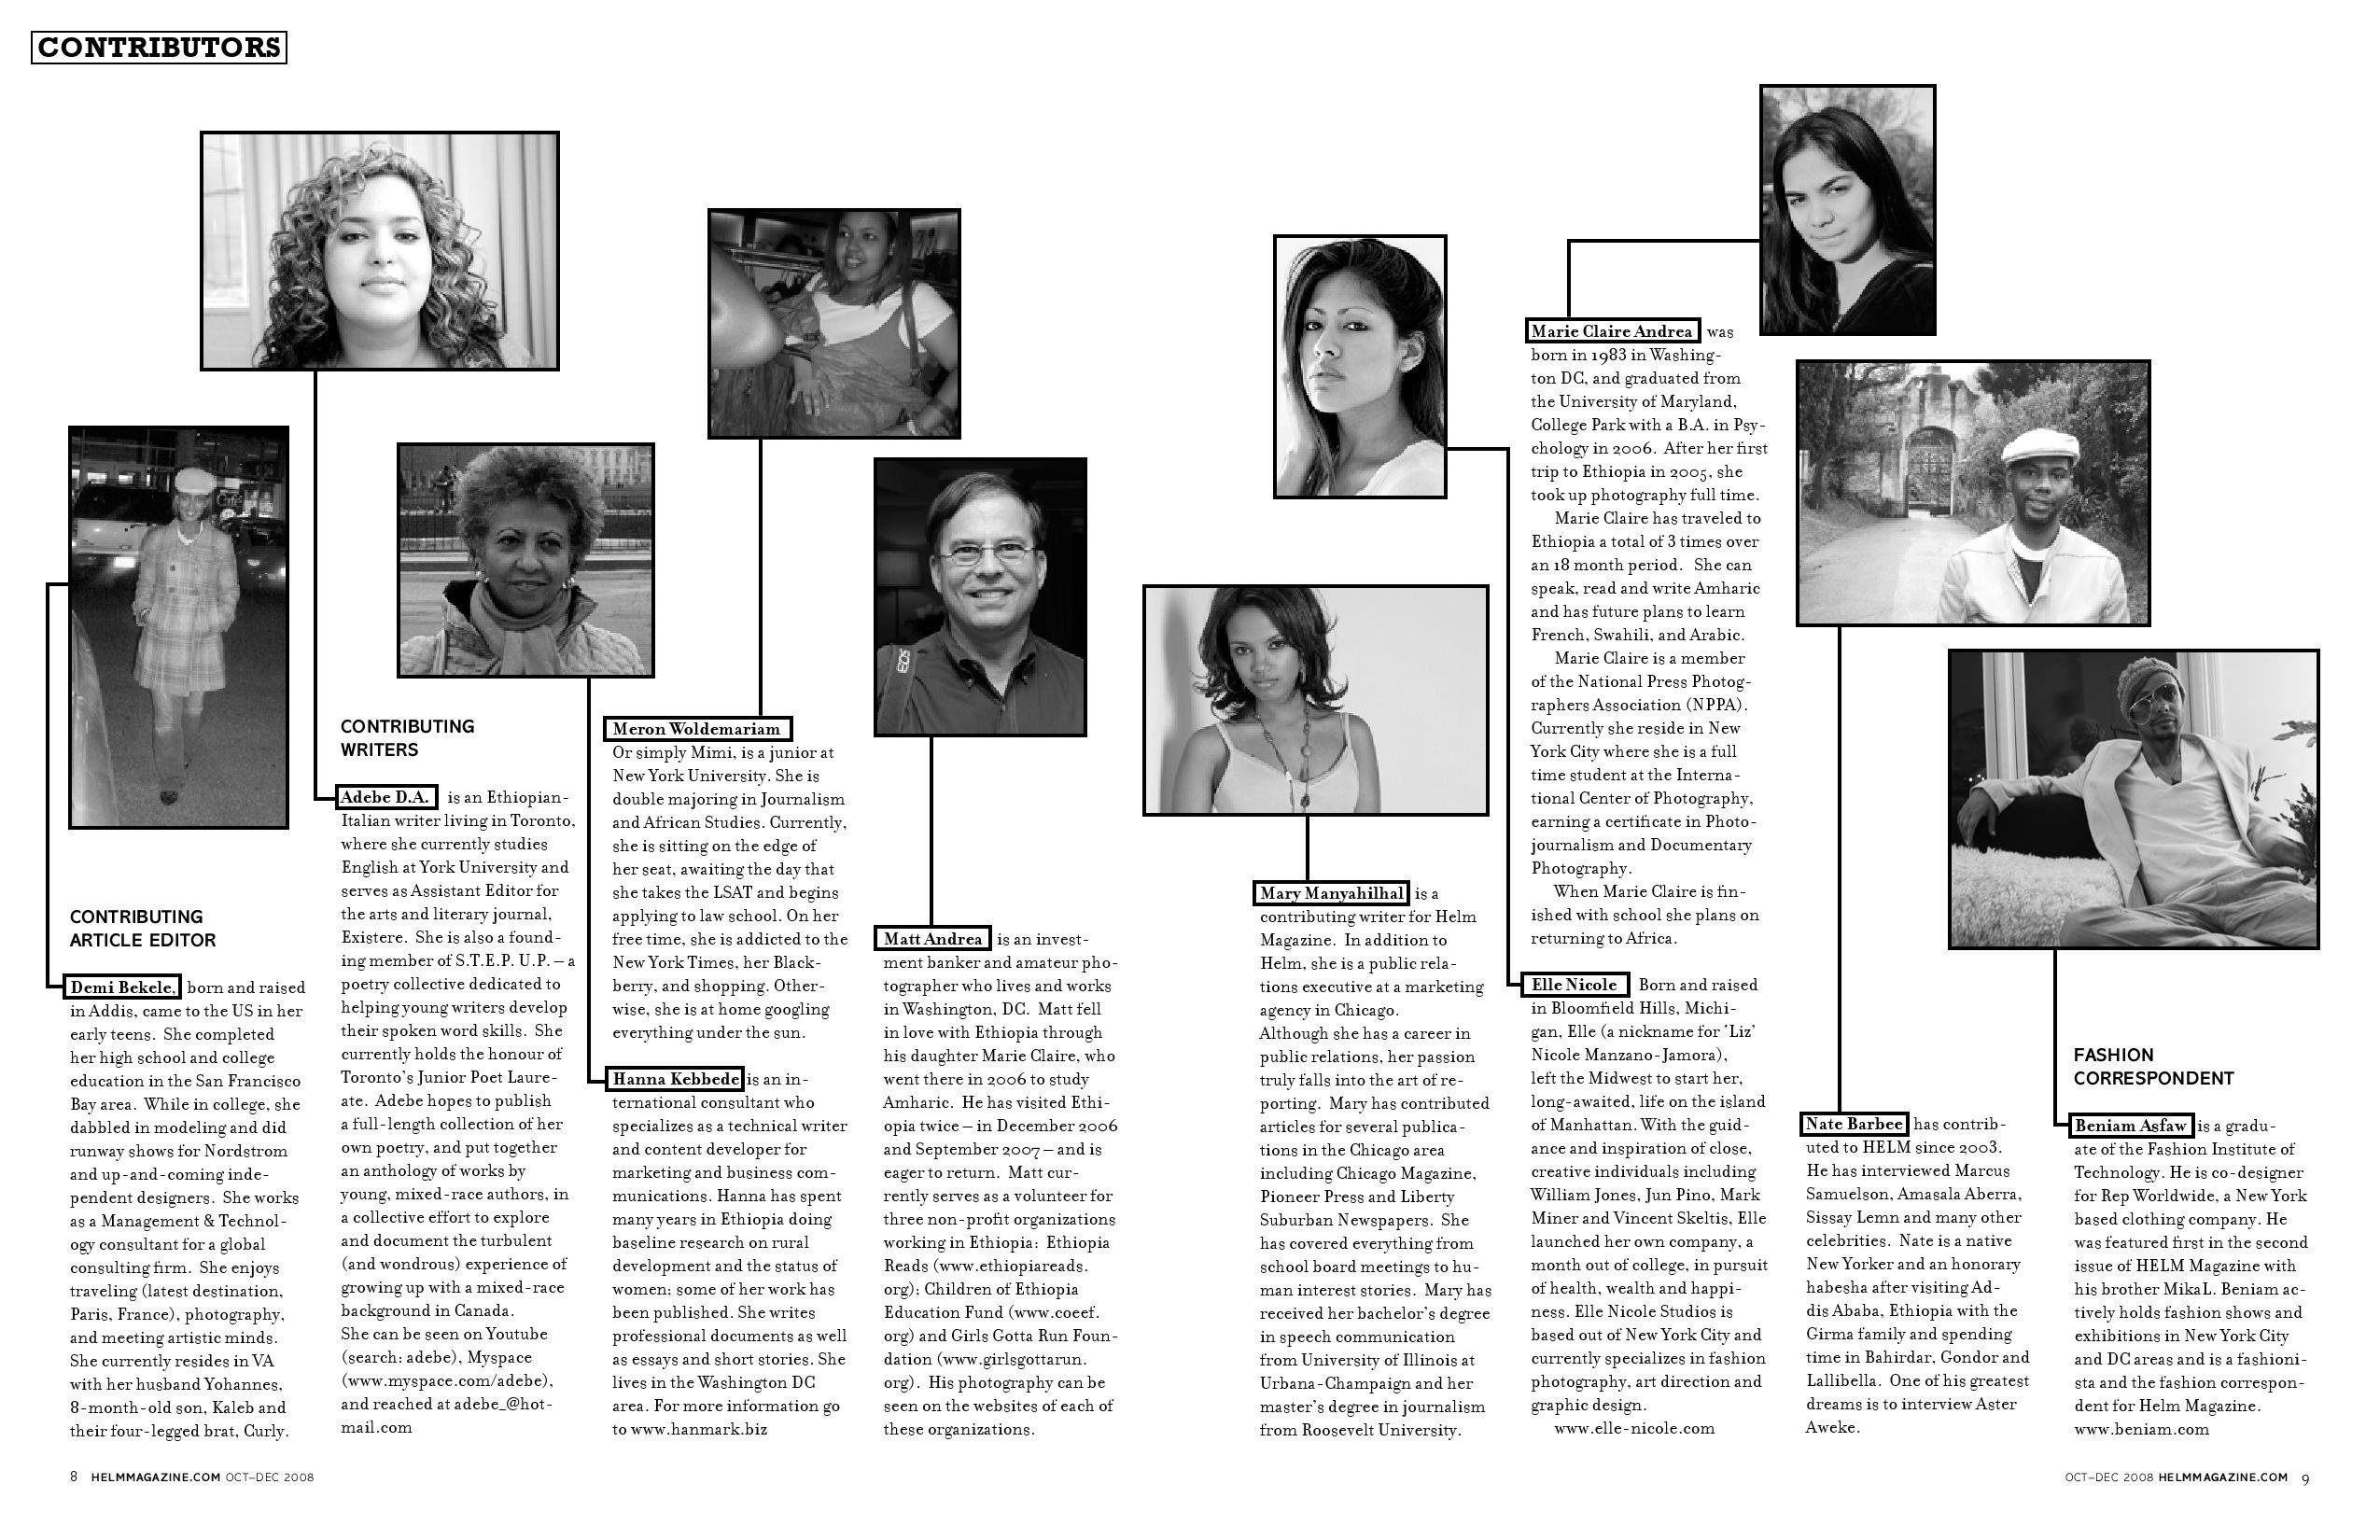 Helm Magazine Oct-Dec 2008 Issue